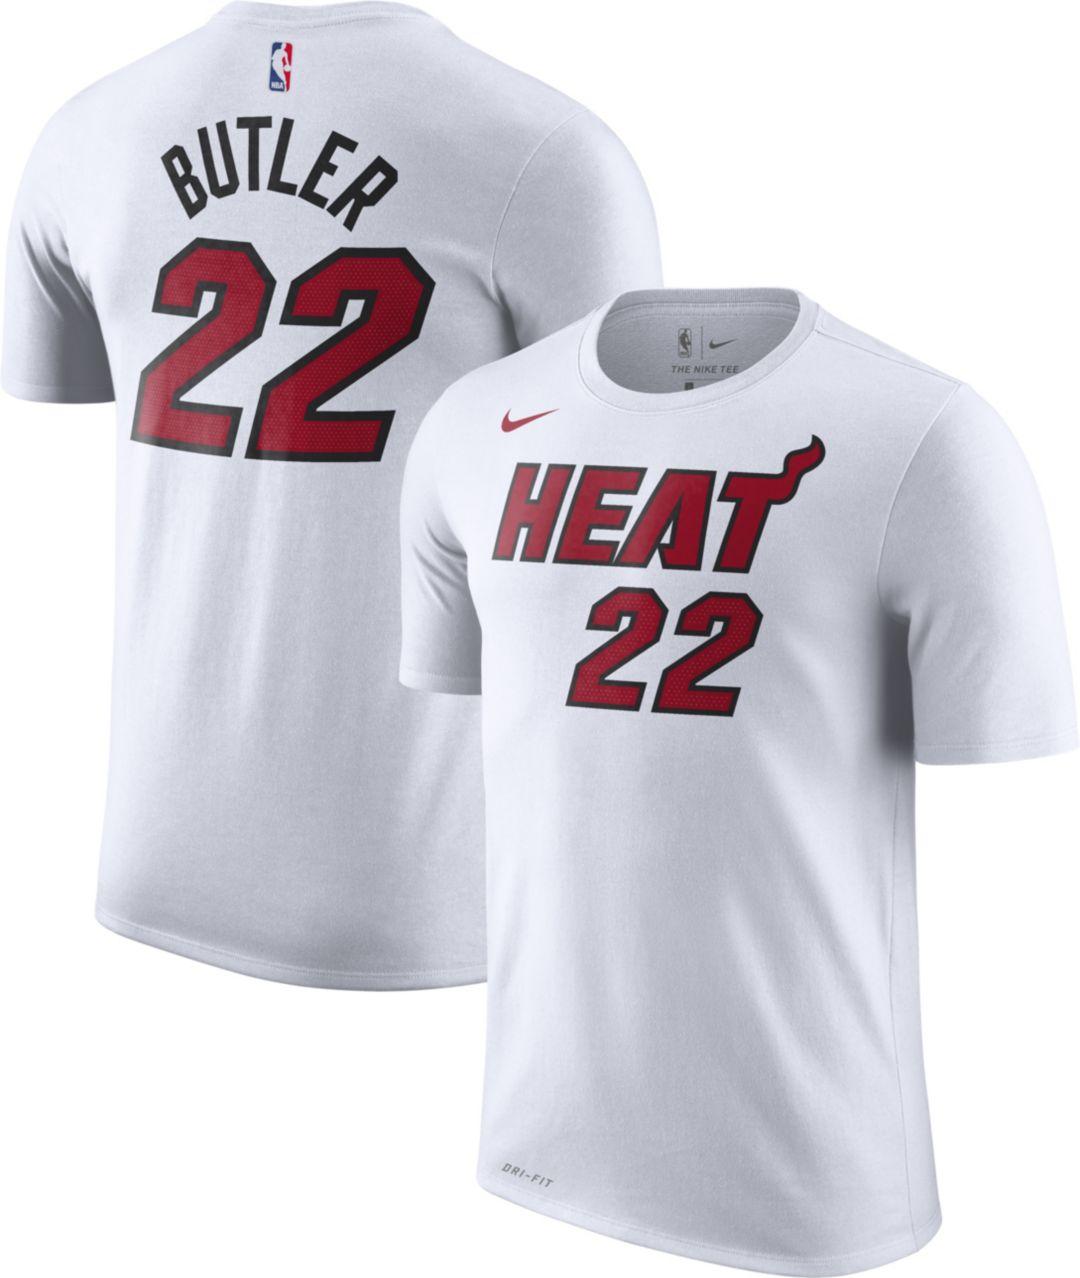 low priced 255fc d65b4 Nike Men's Miami Heat Jimmy Butler #22 Dri-FIT White T-Shirt